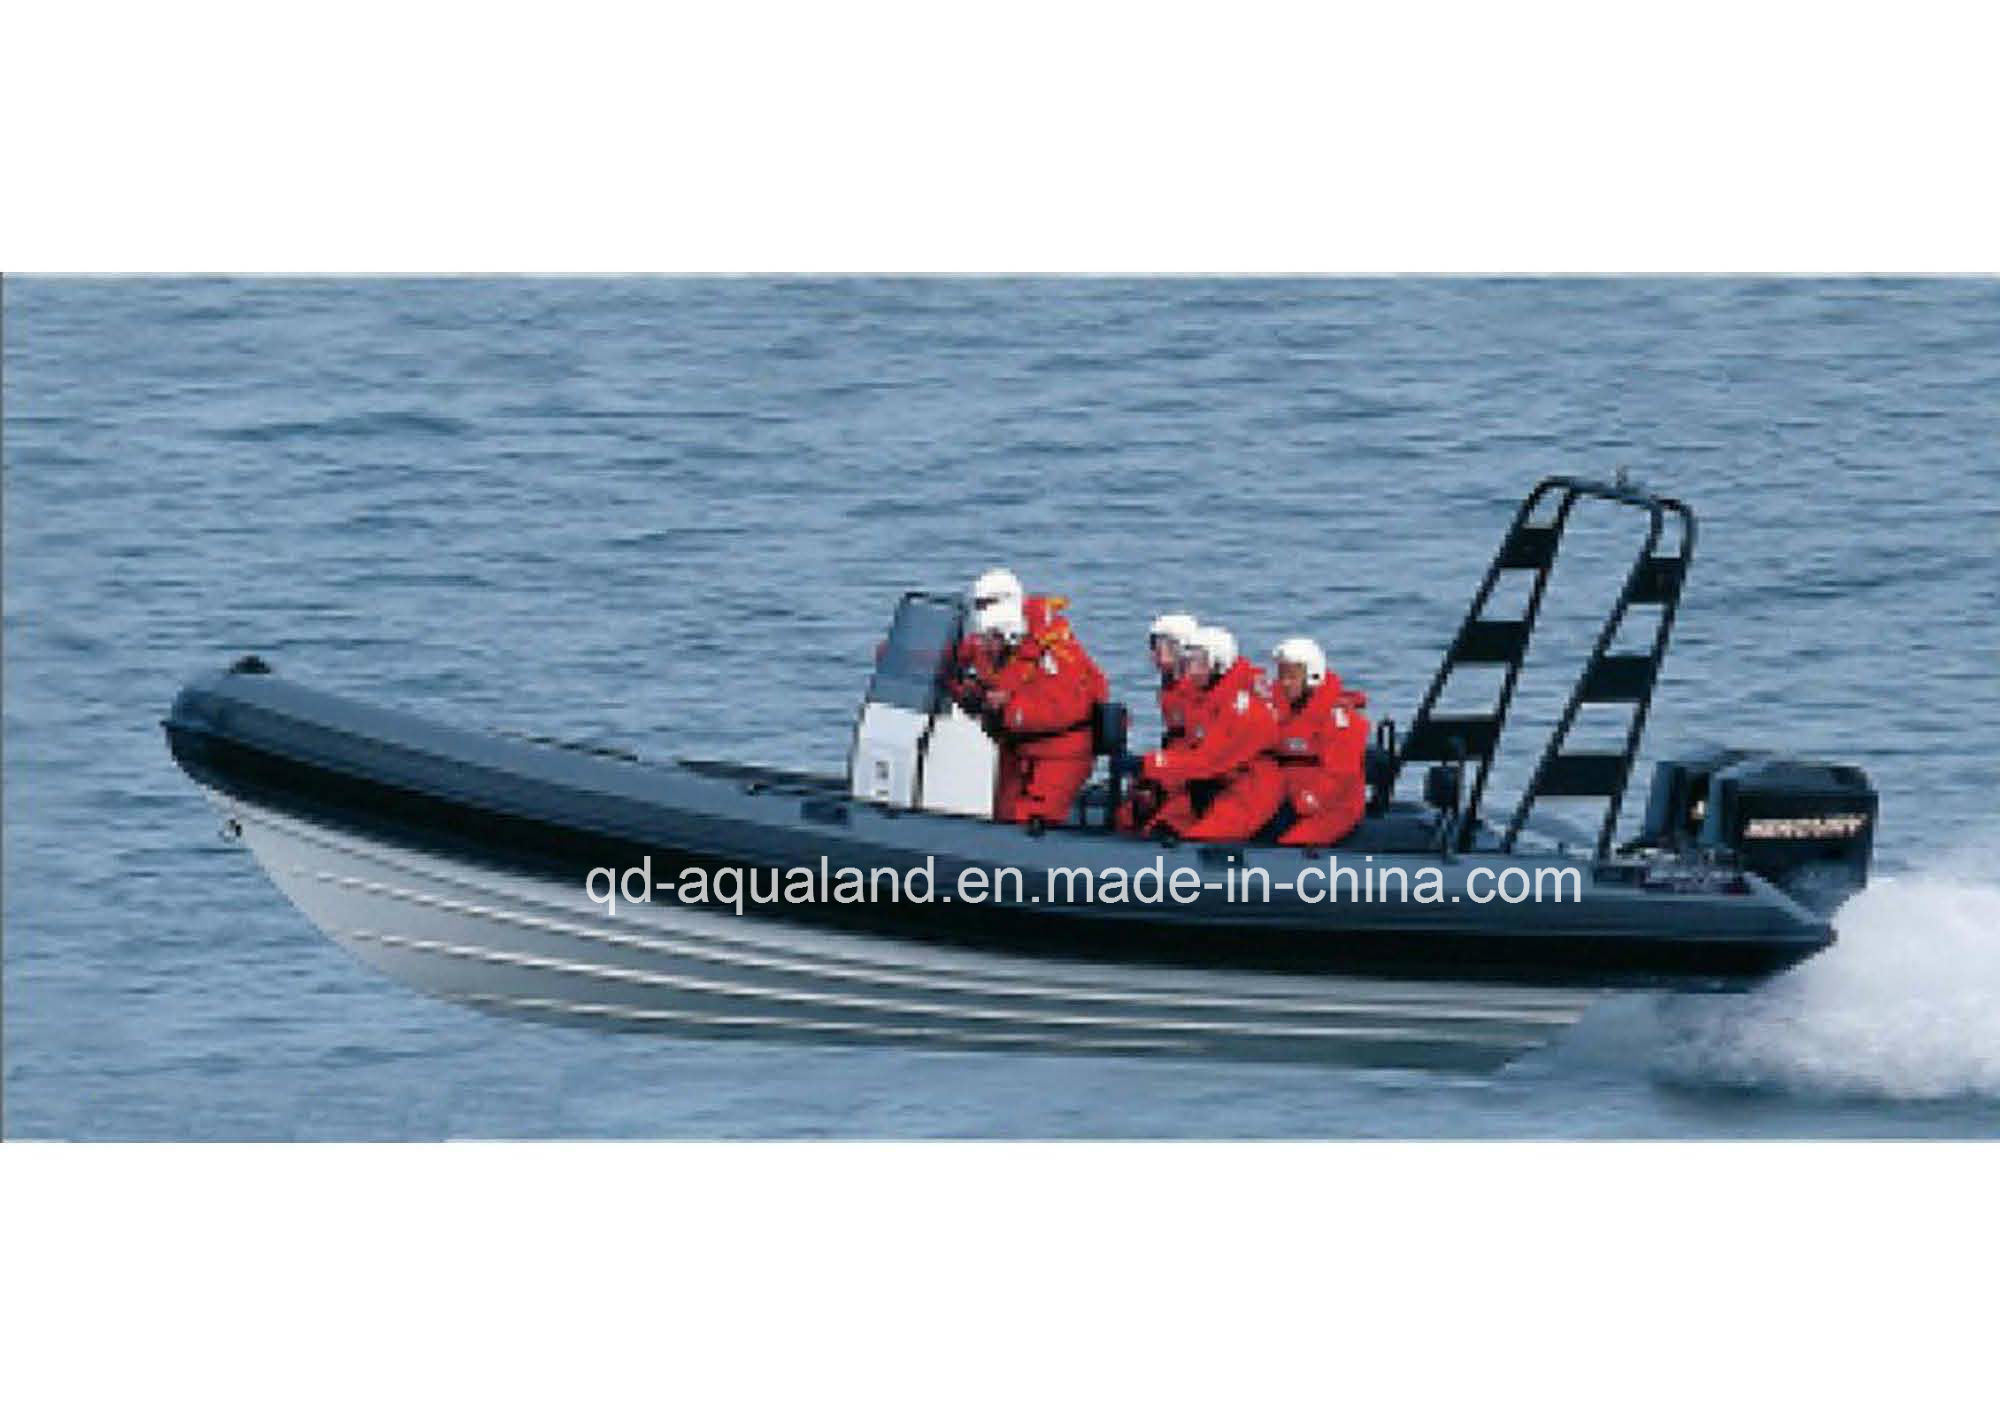 Aqualand 25feet 7.5m Fiberglass Rib Fishing Boat /Military Rigid Inflatable Boat/Rescue Motor Boat (RIB750B)